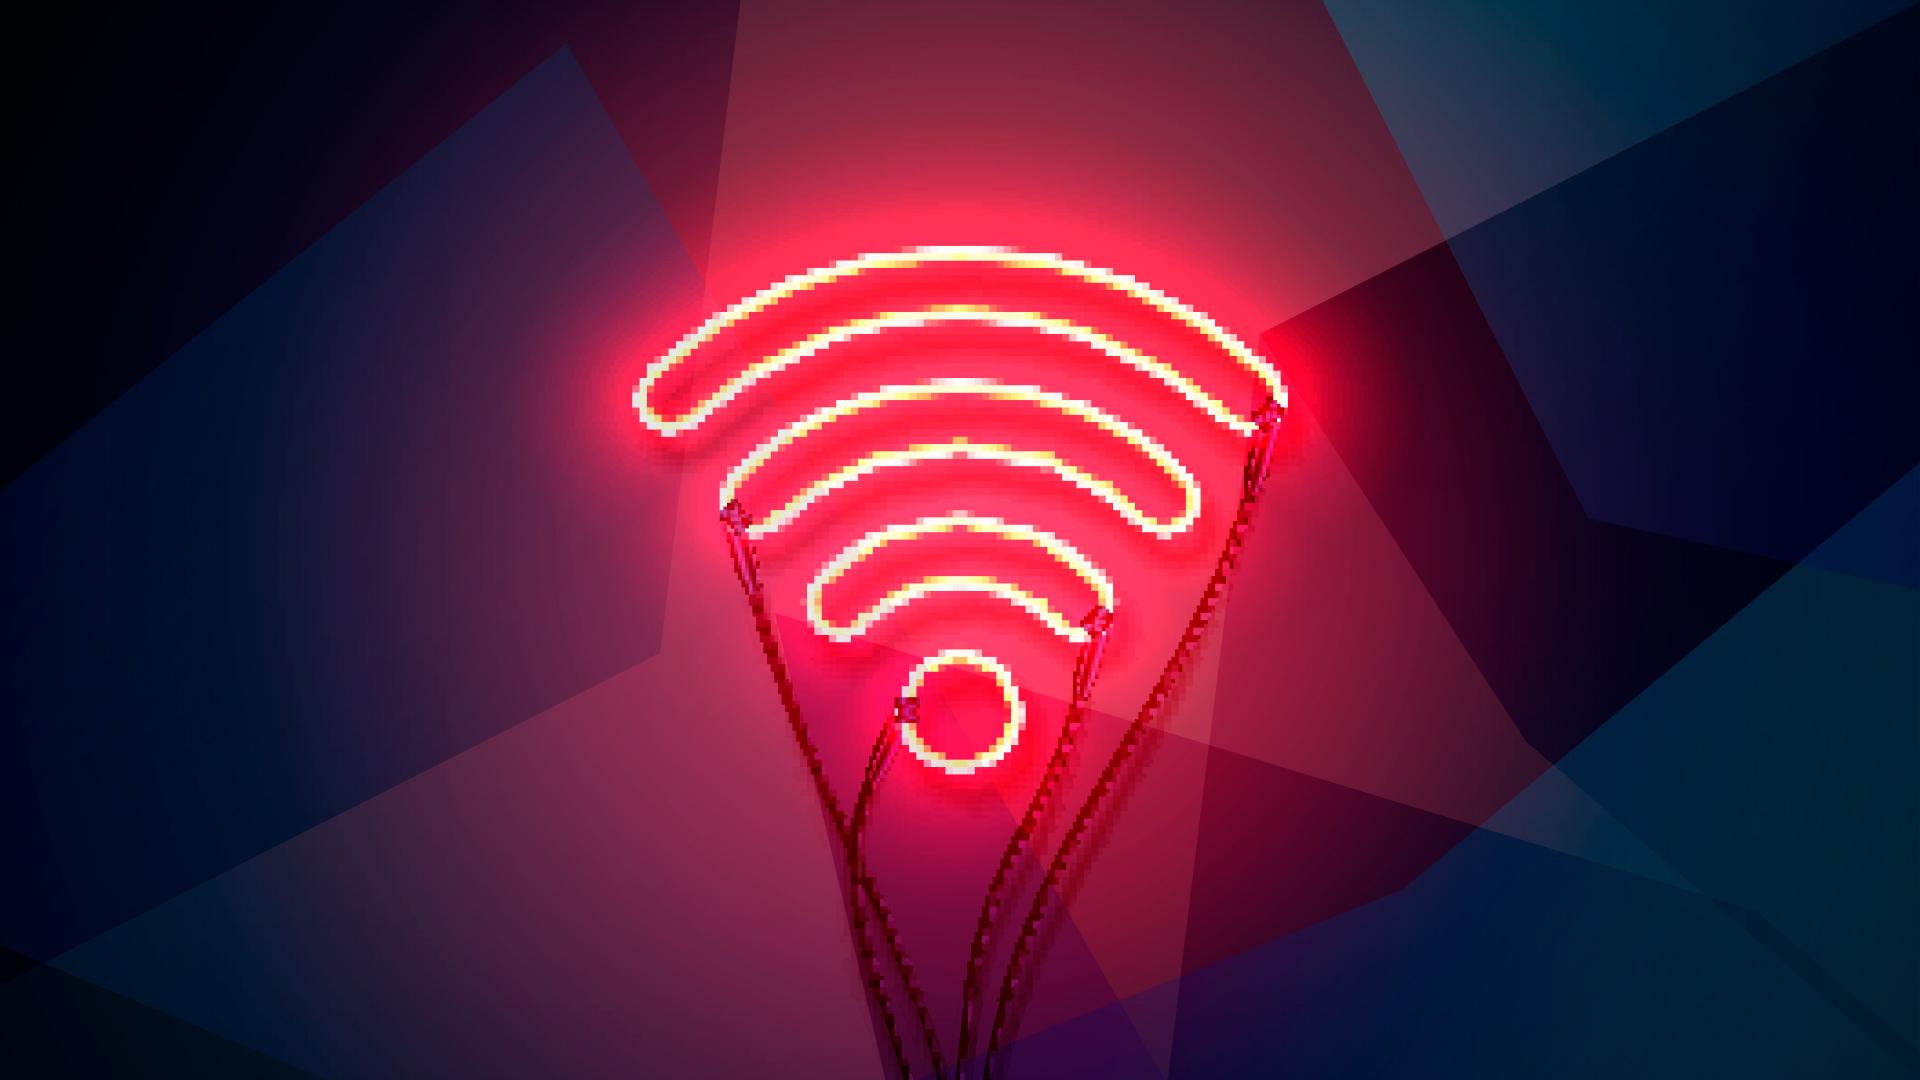 Wlan, WiFi, Wireless, Hotspot, Wlan Hotspot, Neon, WifiSpot, Wireless LAN